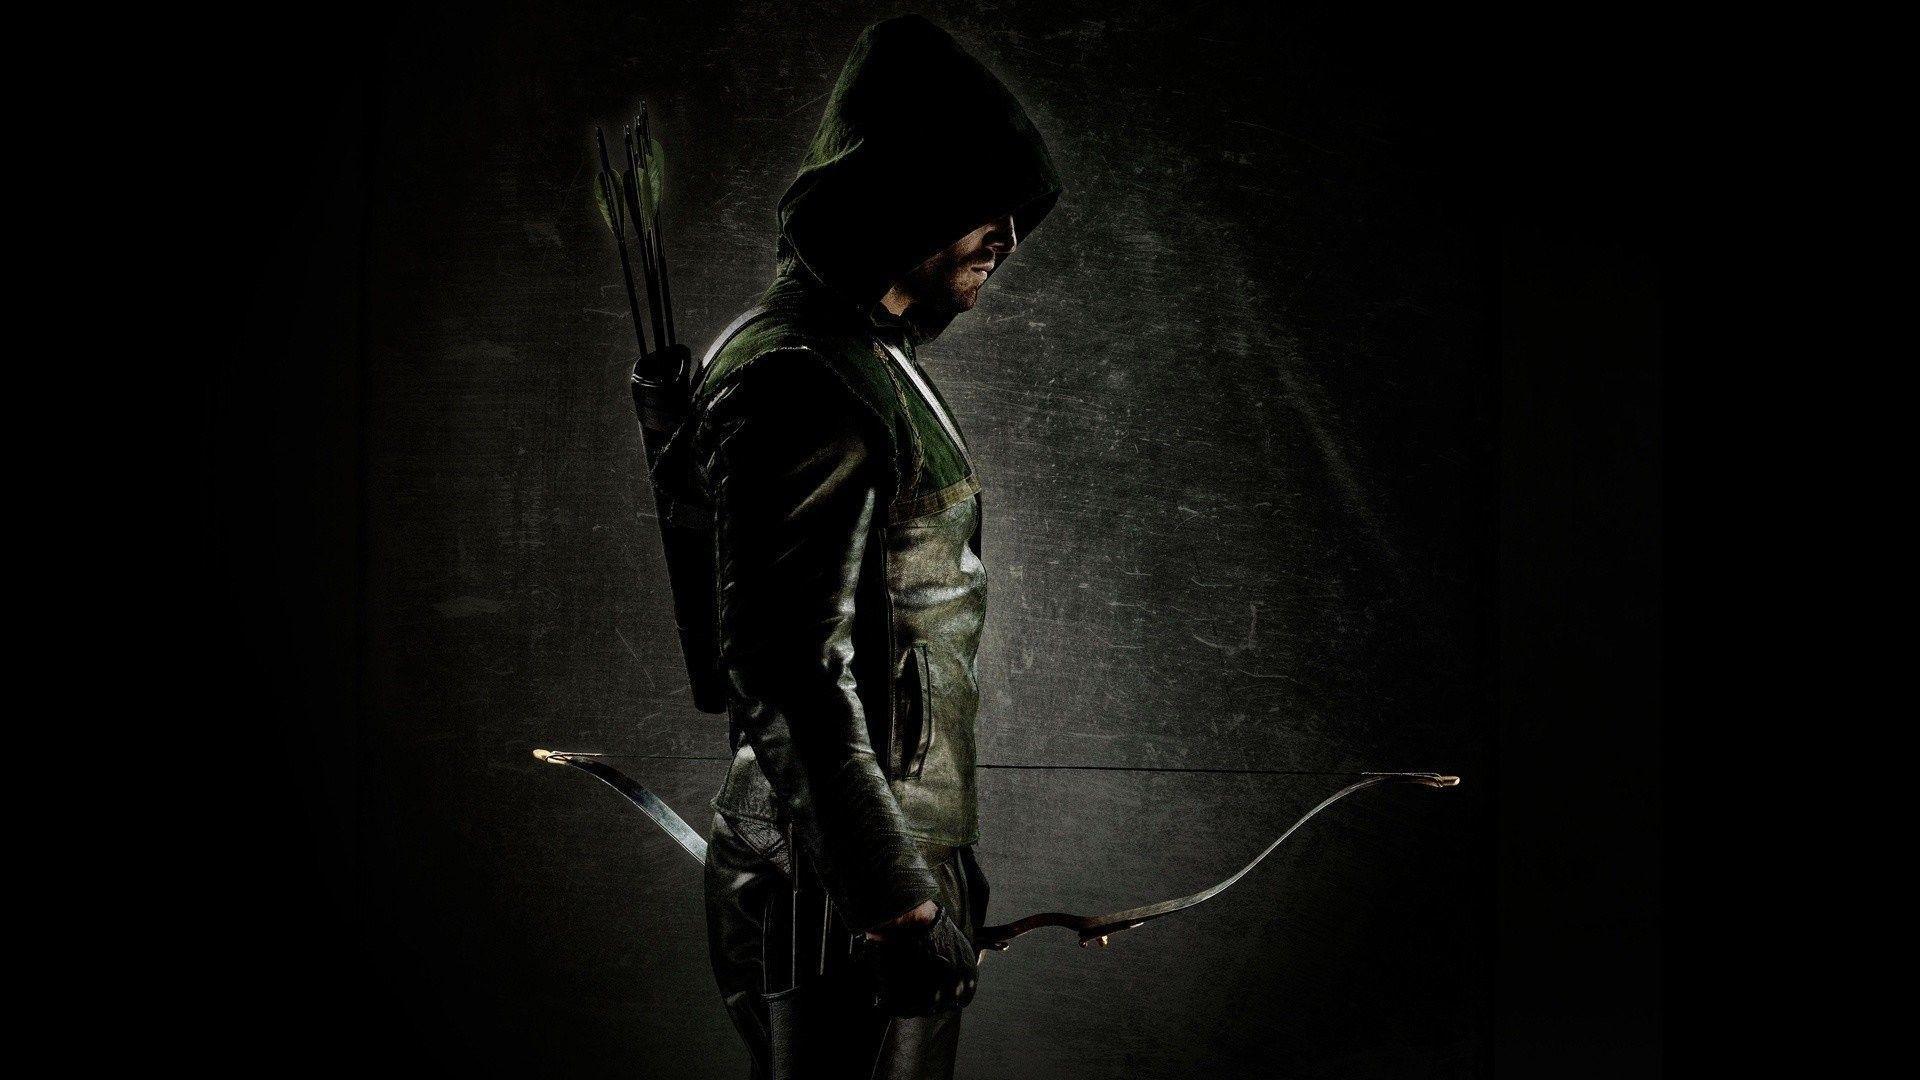 Arrow Wallpapers Top Free Arrow Backgrounds Wallpaperaccess